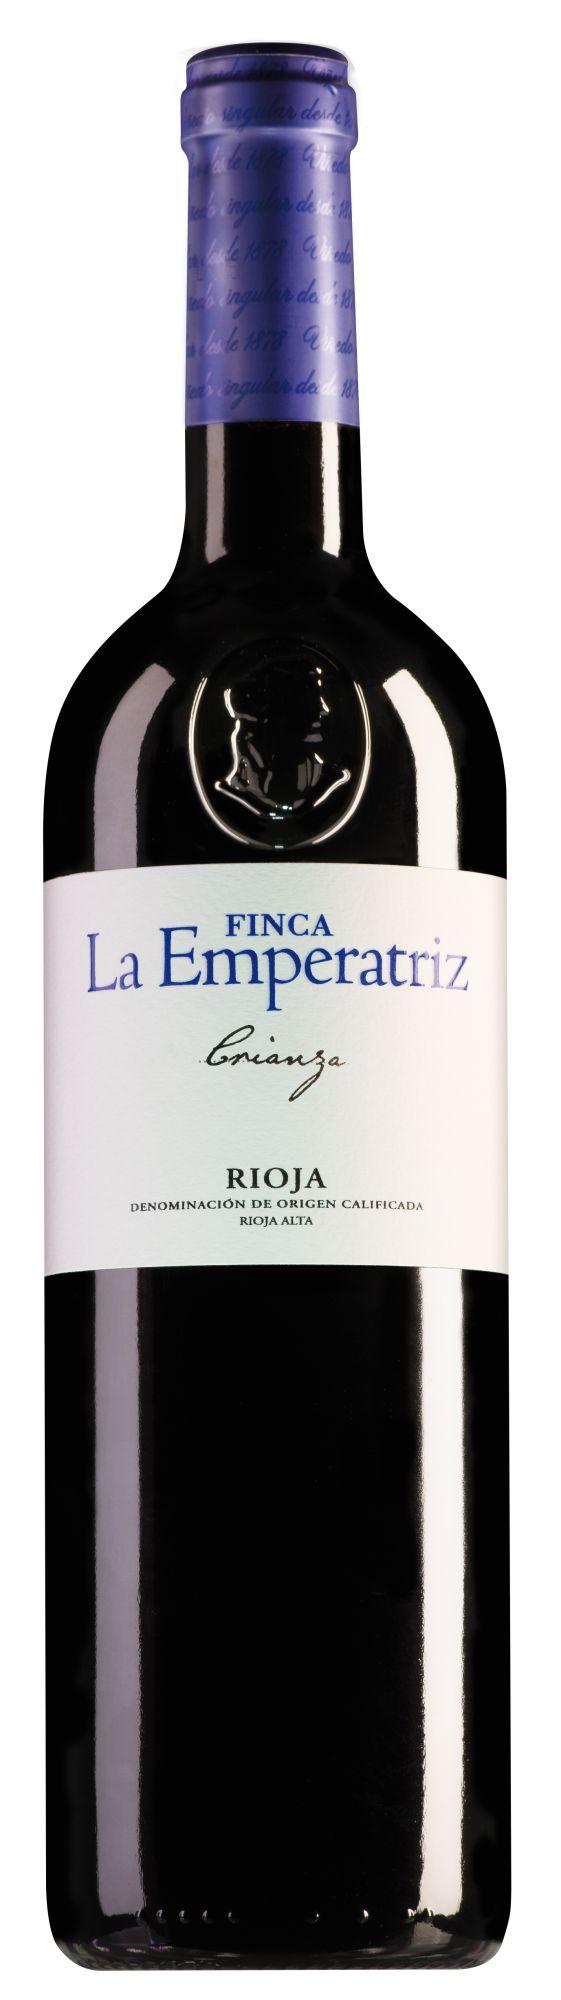 Finca La Emperatriz Rioja Crianza